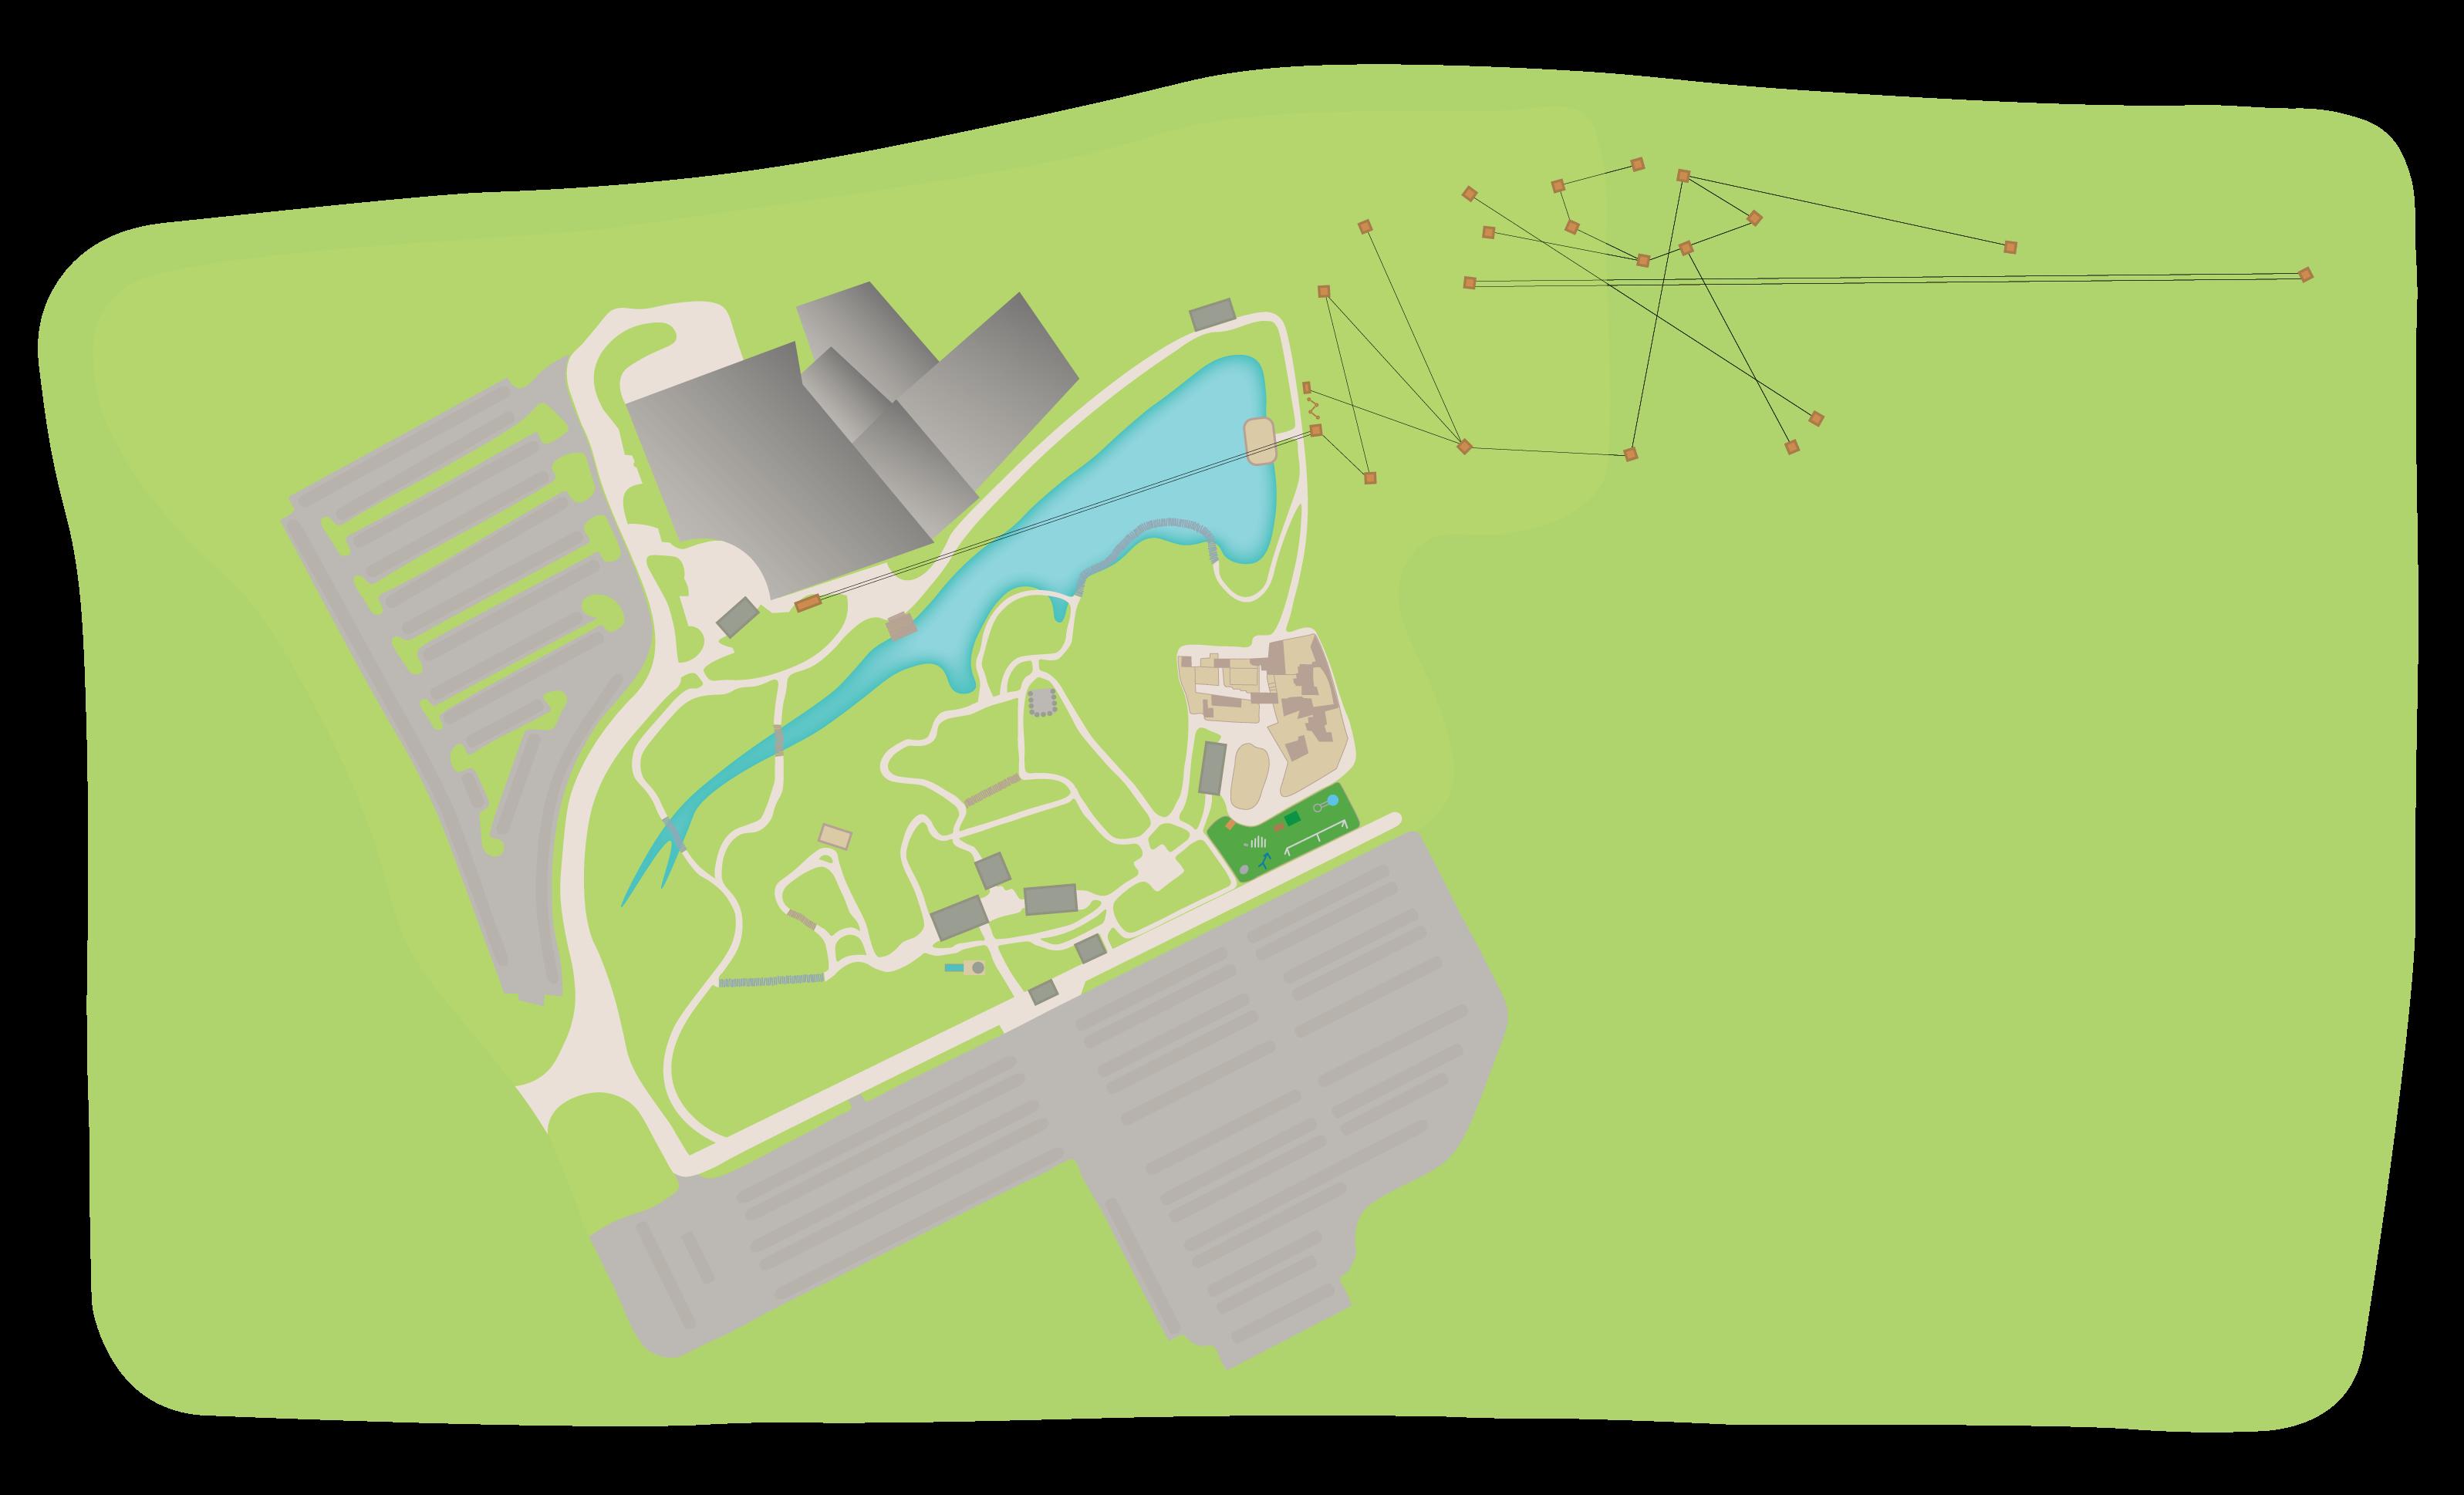 laumeier sculpture park map, forest park map, st louis science center map, airport map, navy pier map, soulard neighborhood map, saint louis university map, scottrade center map, on inside city museum map